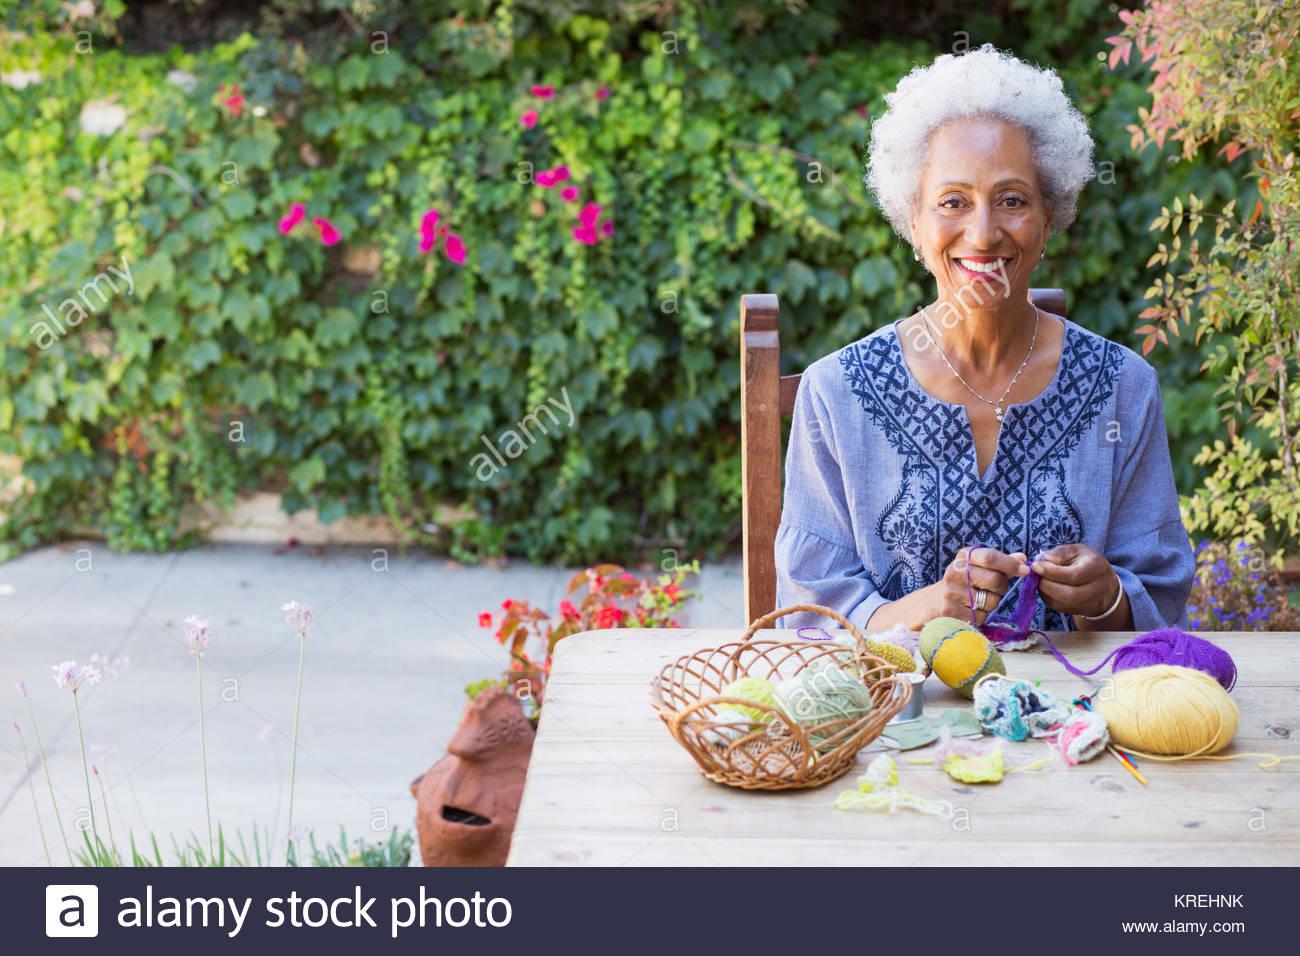 Black woman knitting outdoors - Stock Image